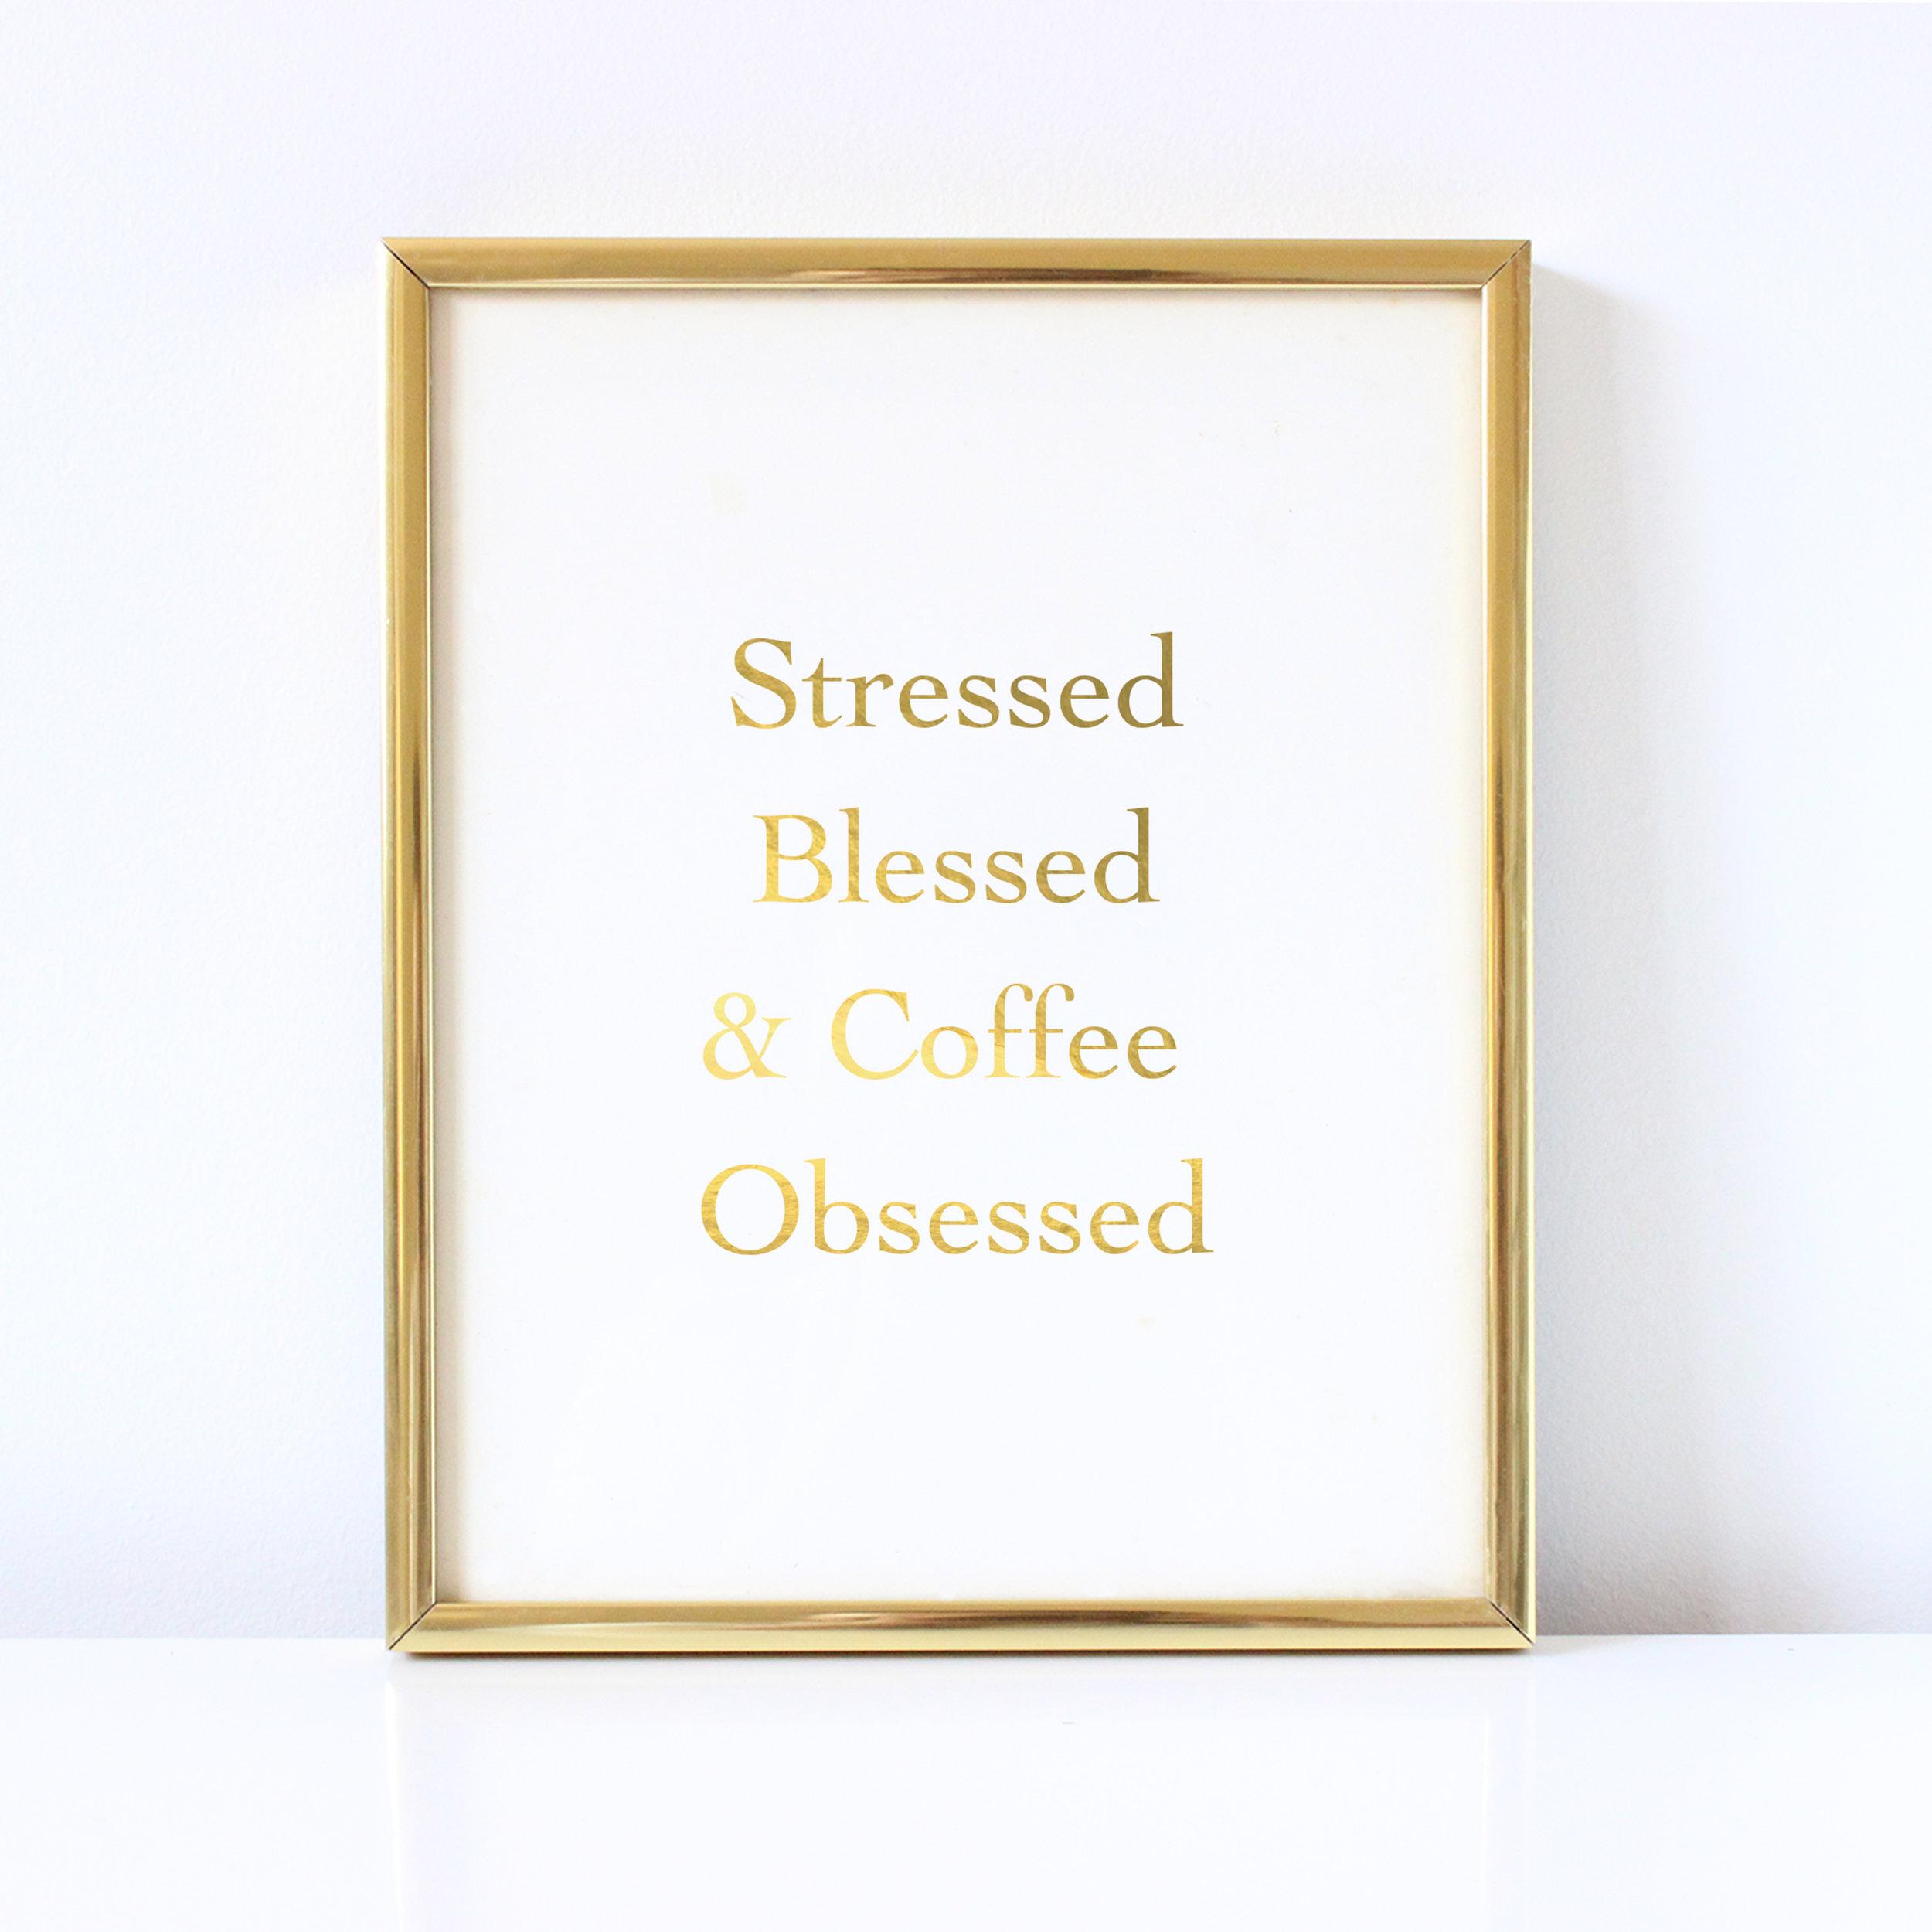 StressedBlessed.jpg